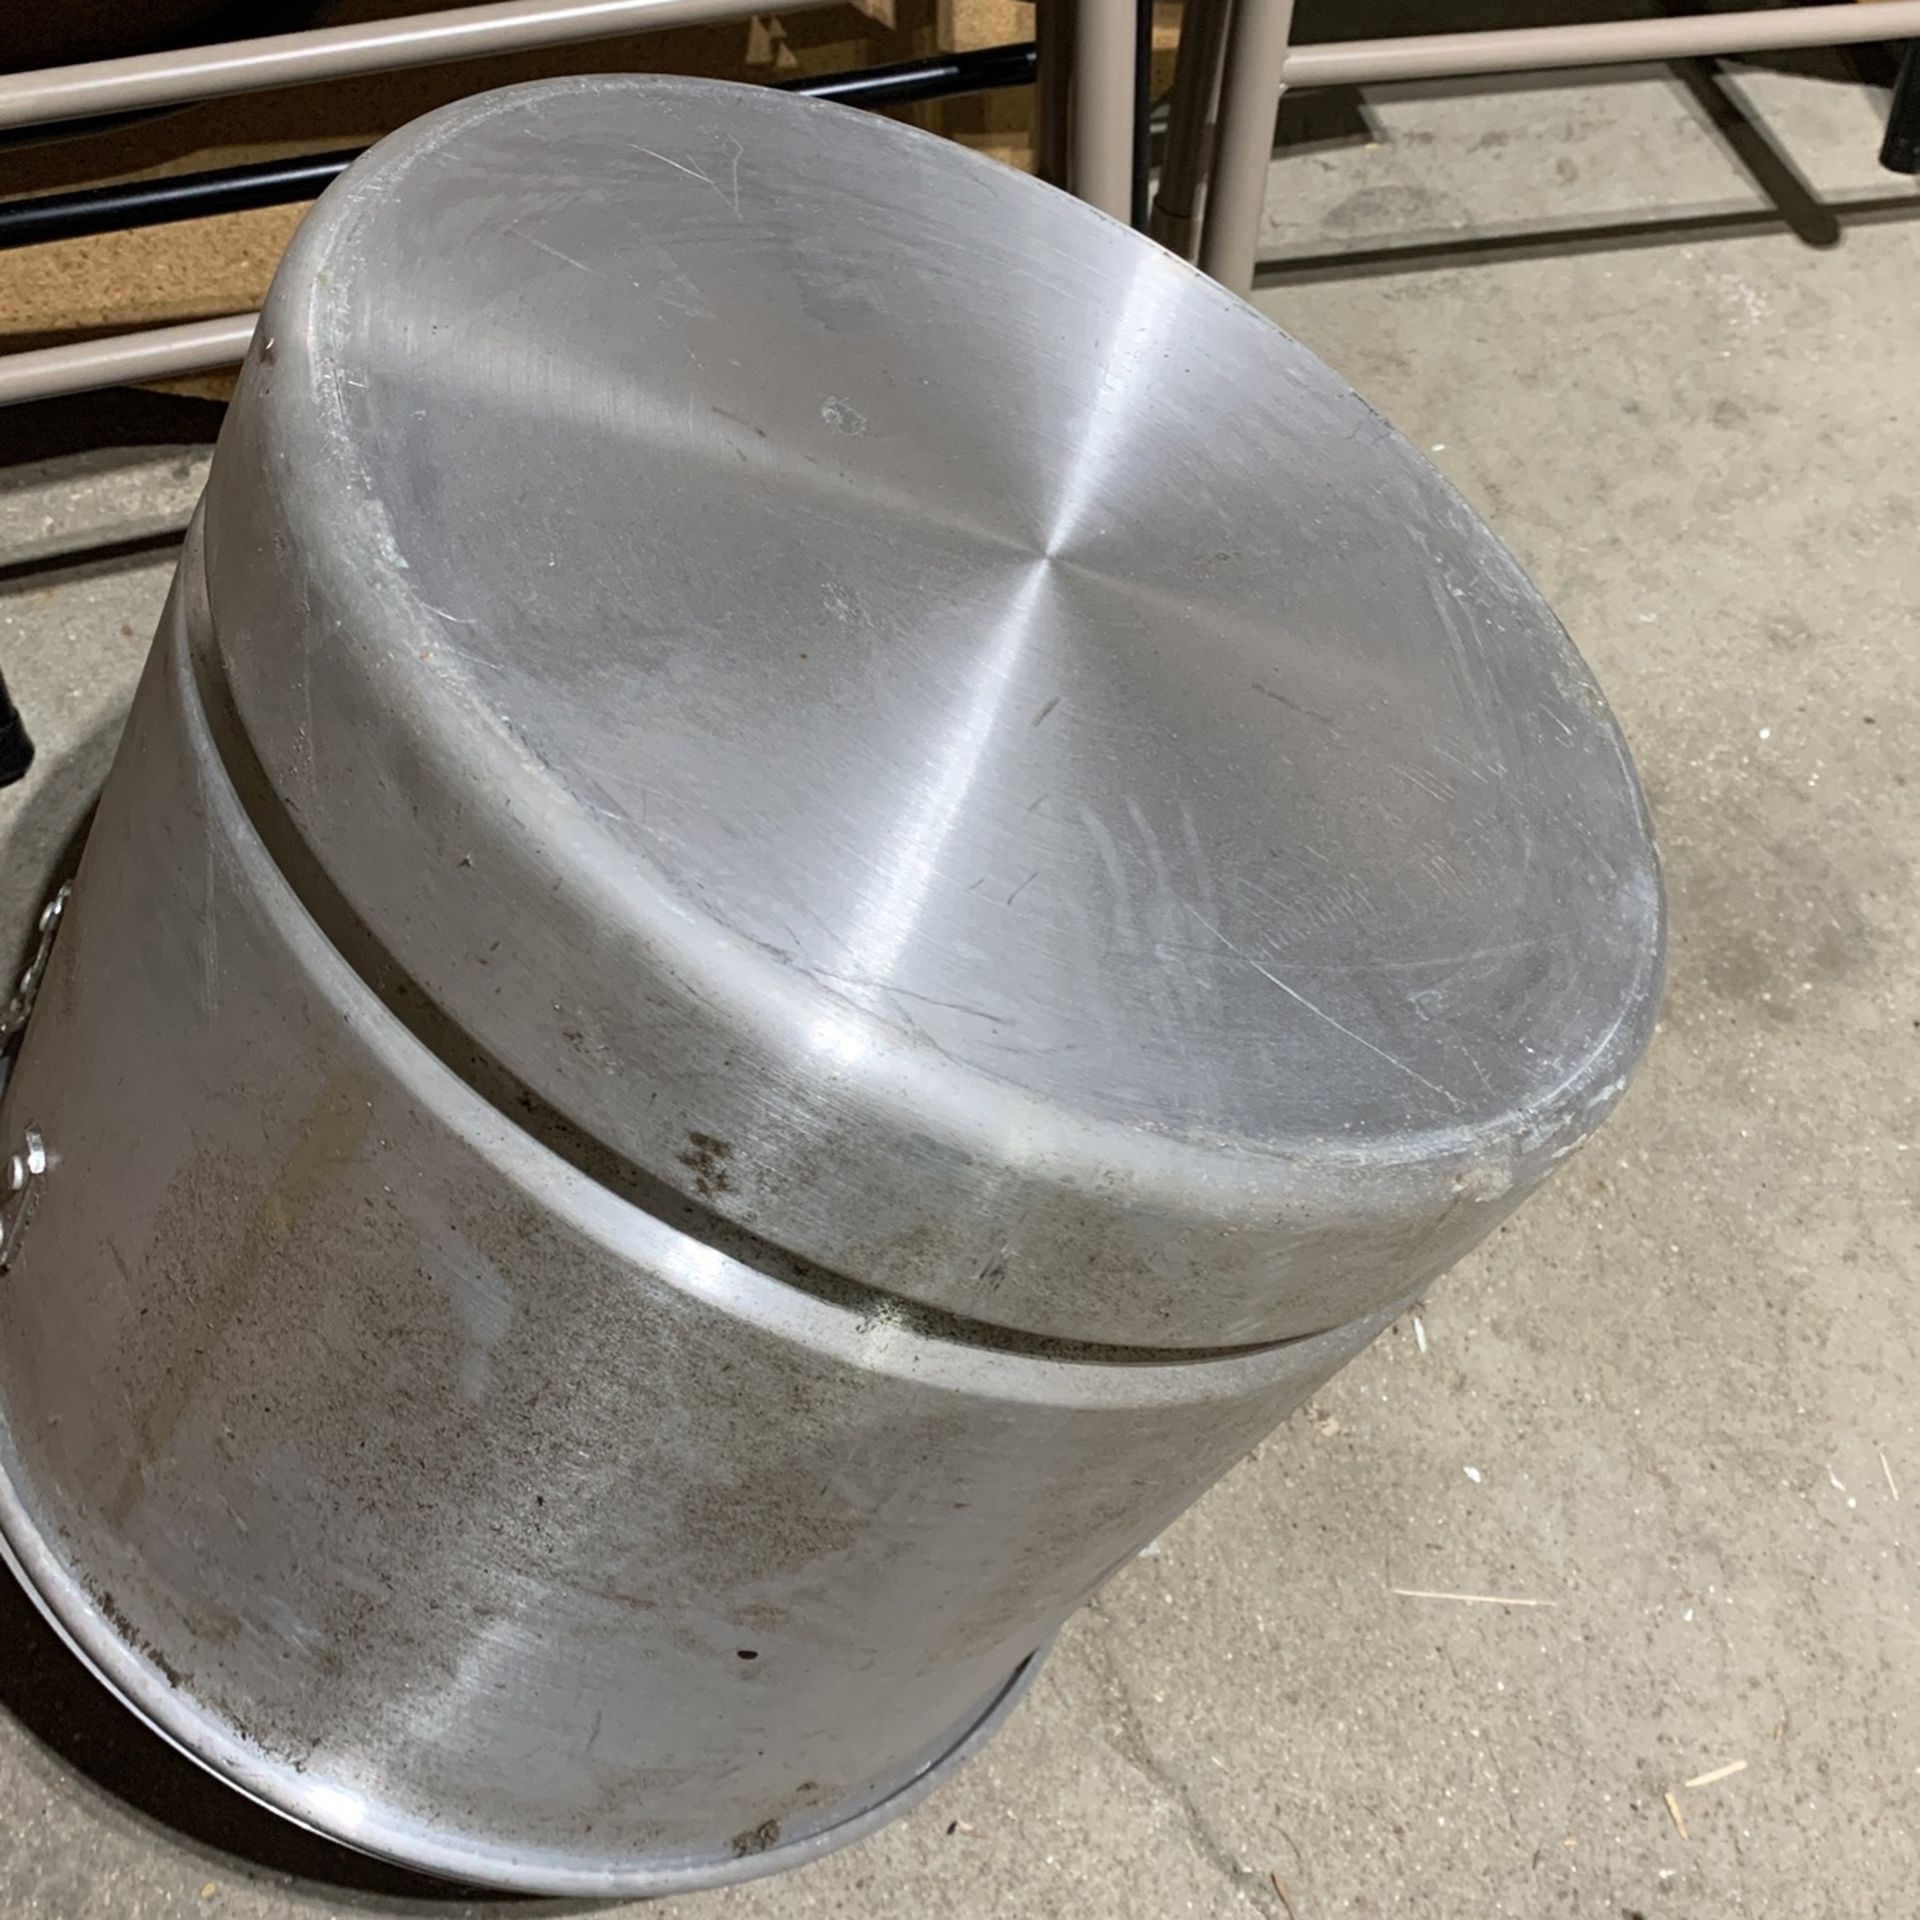 Tamalera/Steamer Pot